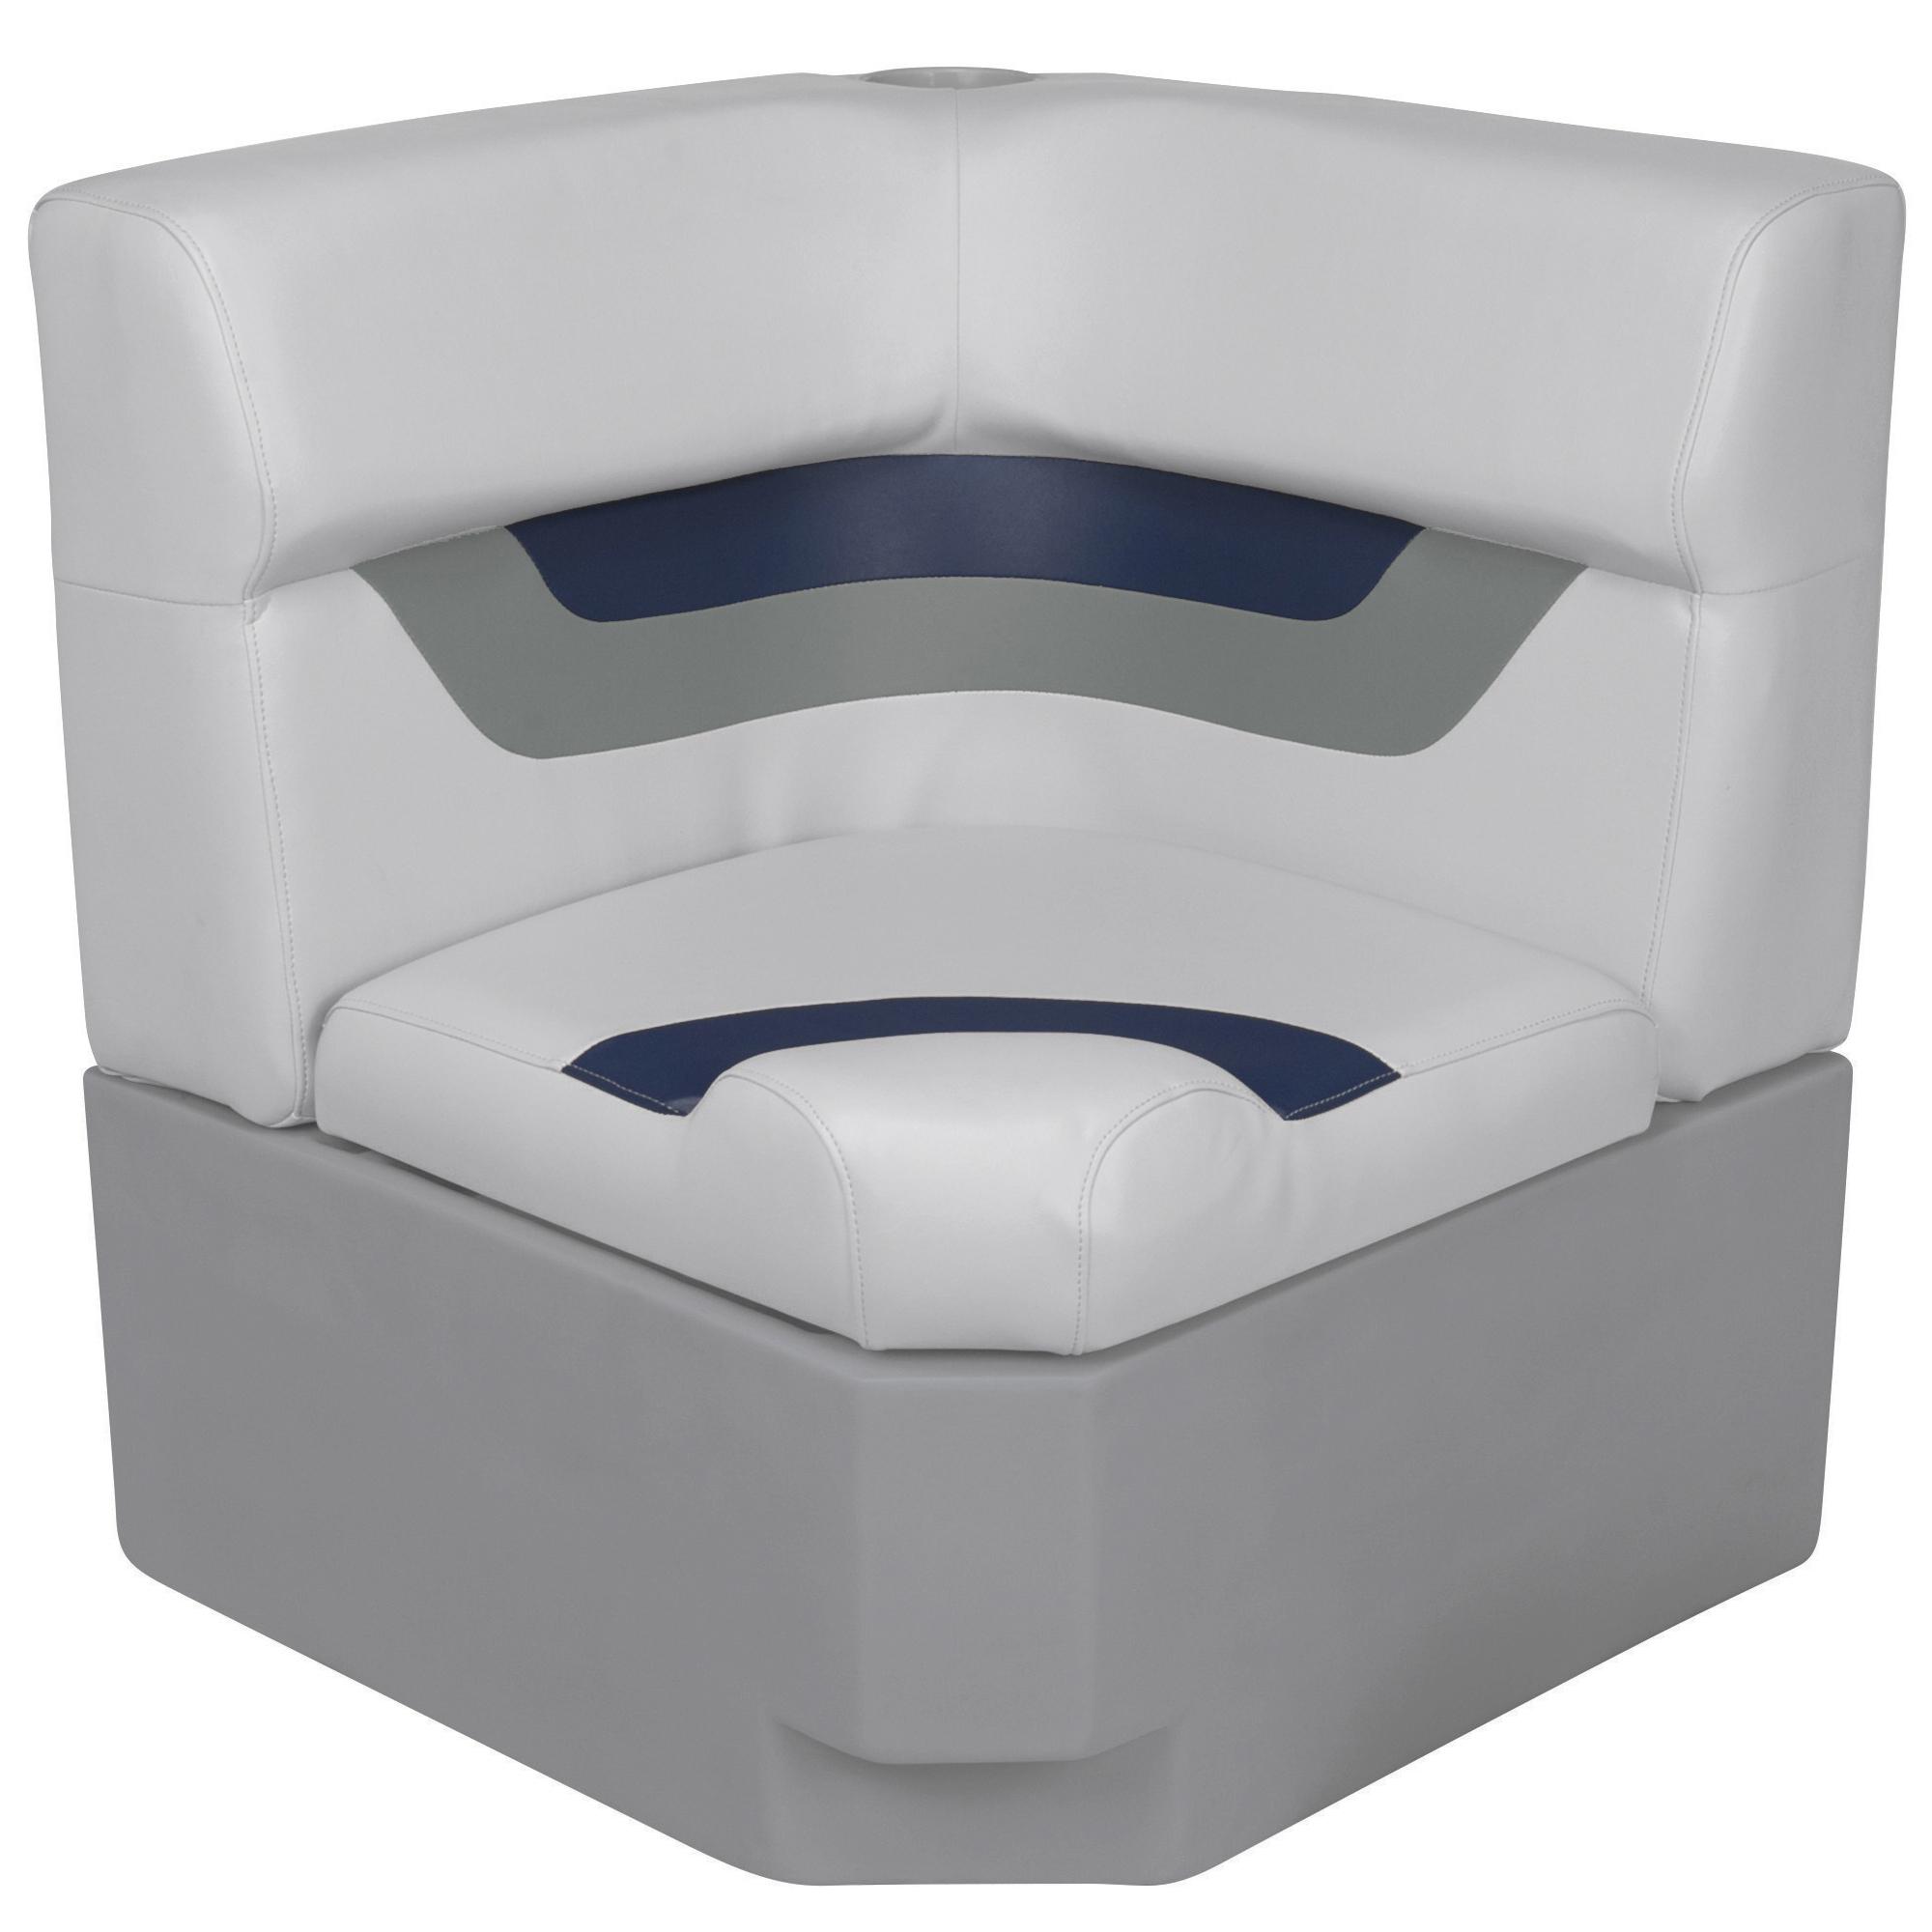 Toonmate Designer Pontoon Corner Section Seat - TOP ONLY - Sky Gray/Navy